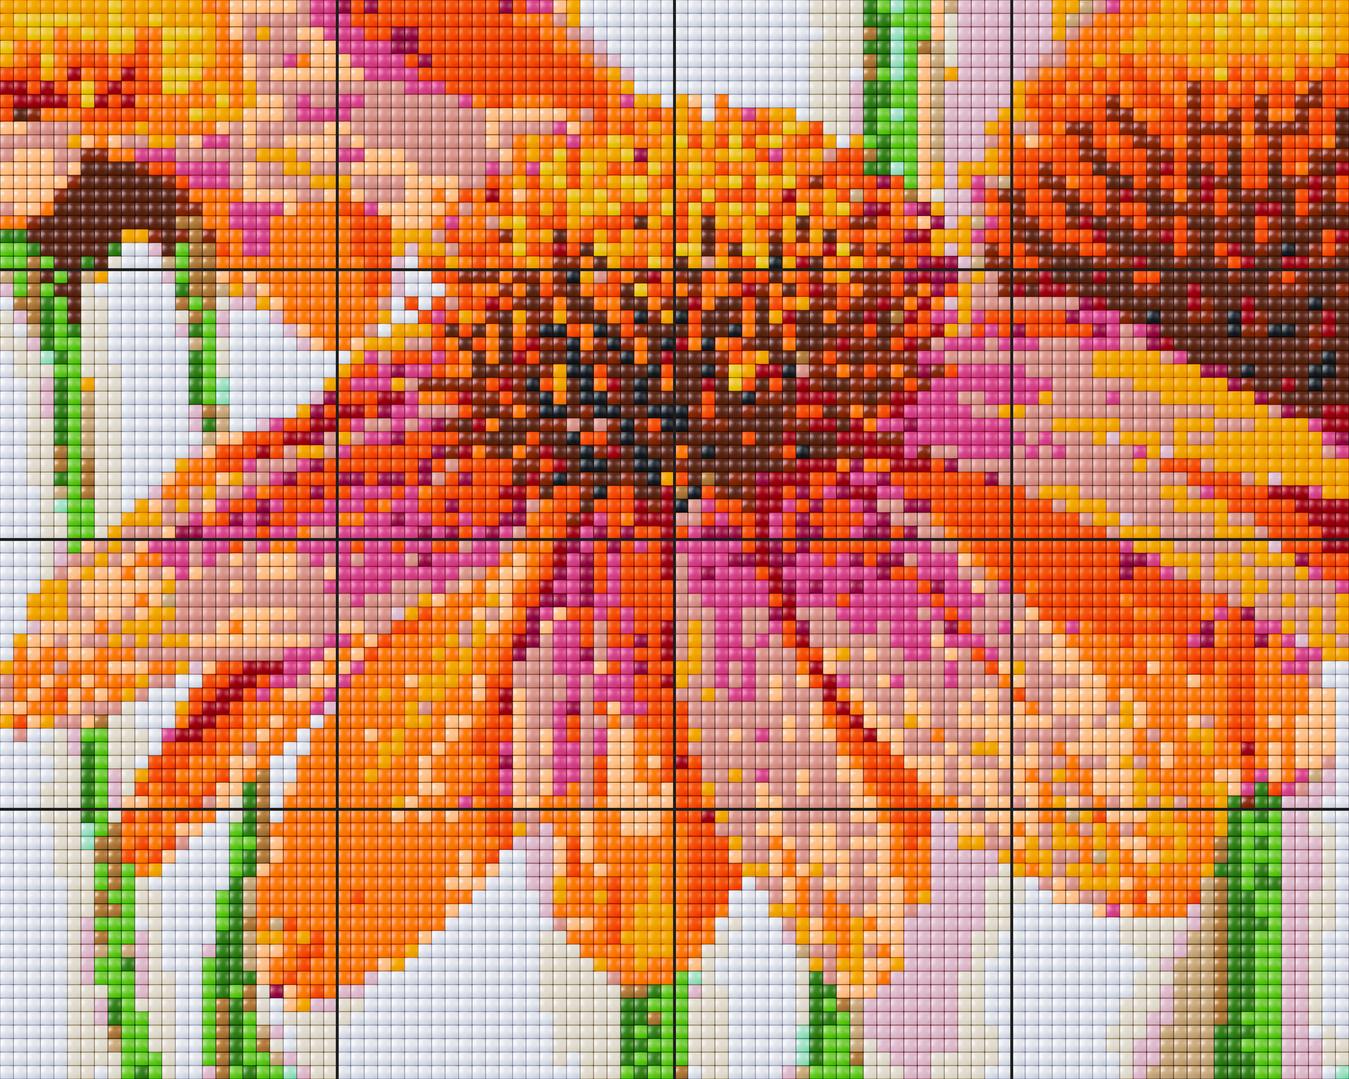 Flowers_4x4L_80x100_XL.png